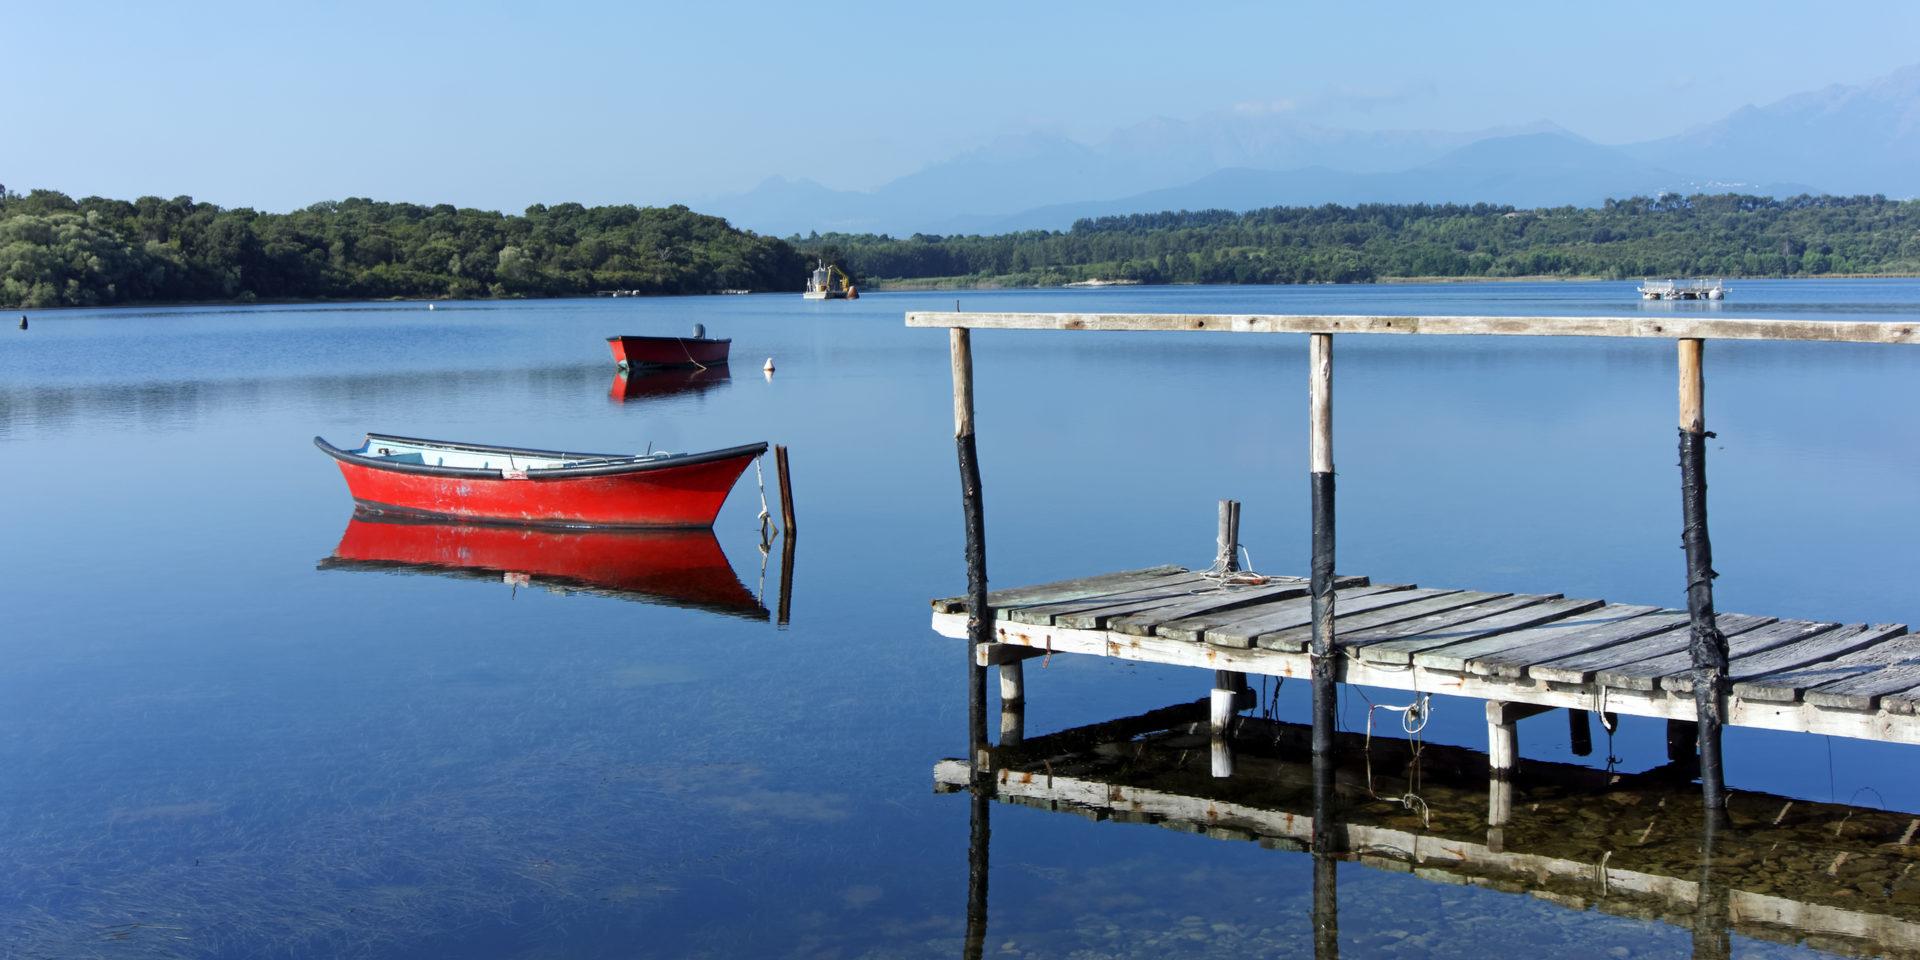 Lac d'Urbino Corsica Frankrijk meer lagune vissersboot steiger